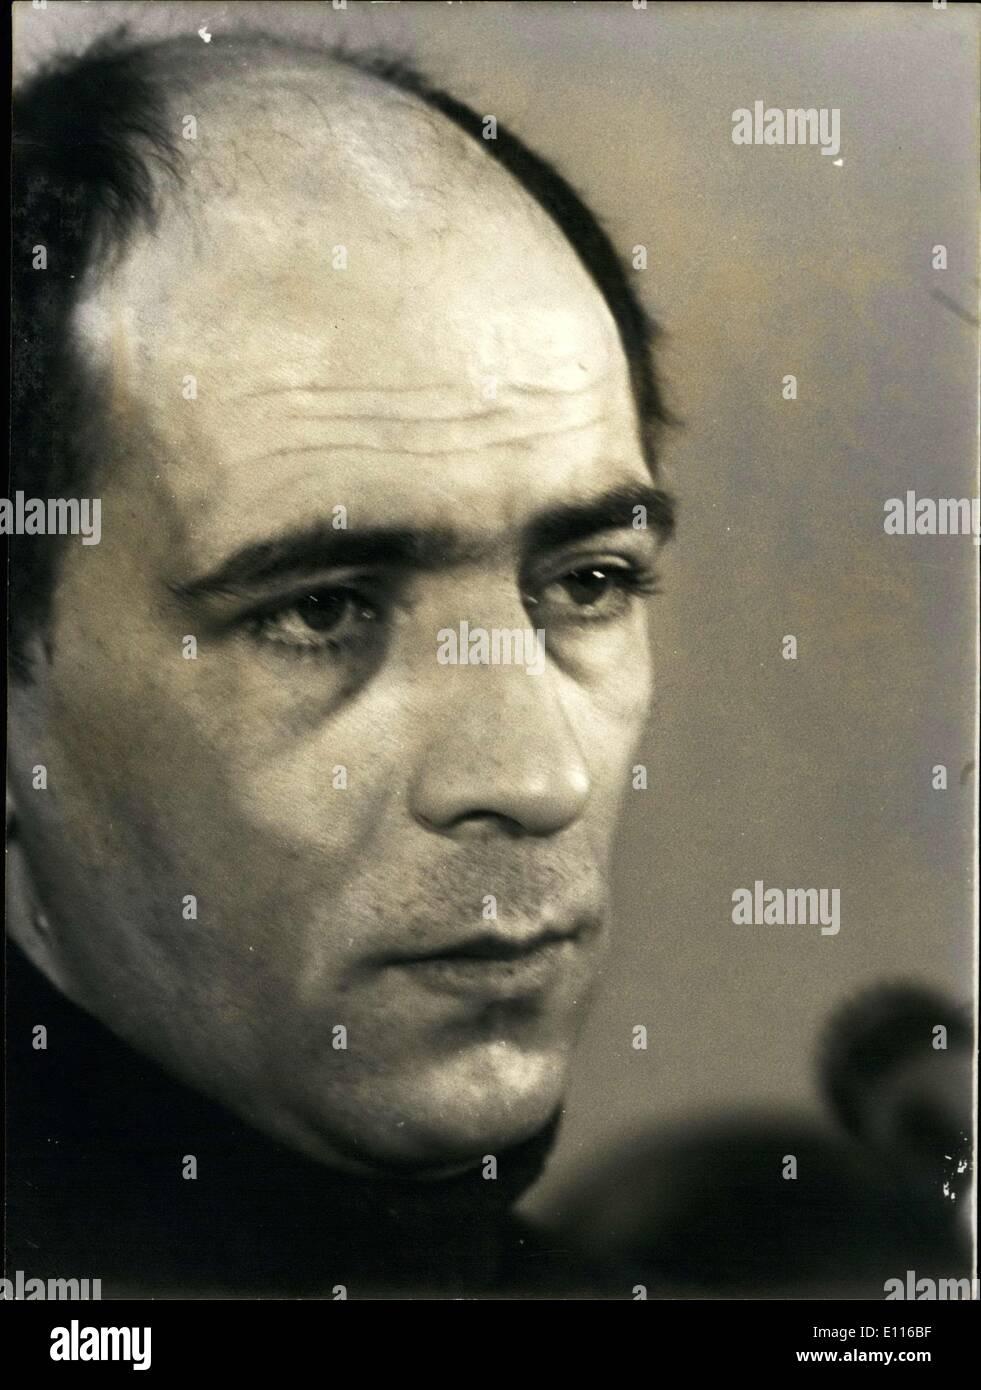 Feb. 03, 1976 - Ukrainian Mathematician Leonid Plyushch - Stock Image